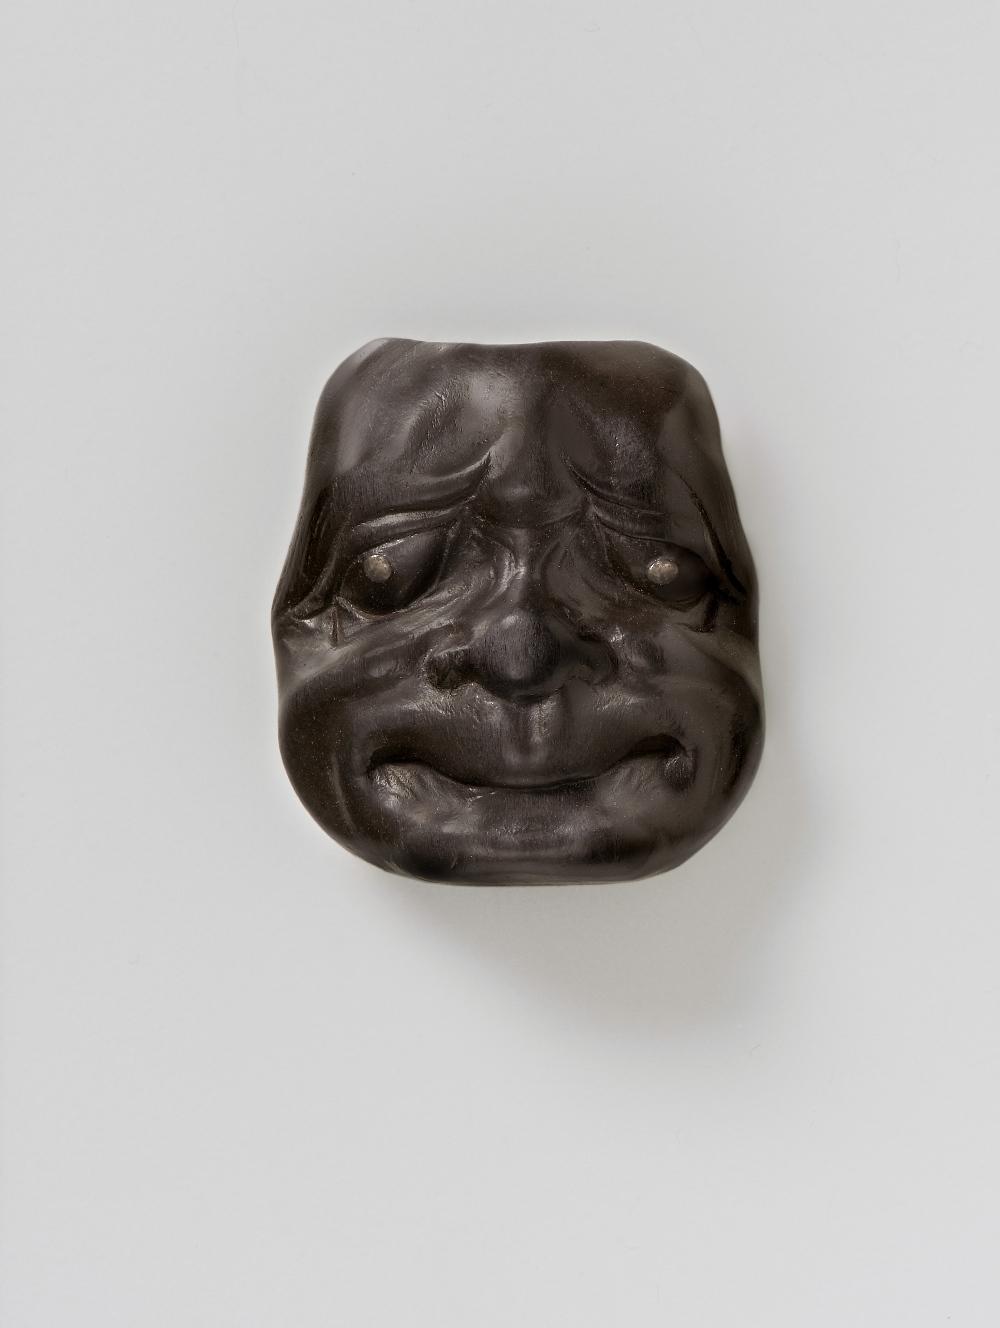 MR3071Dark wood mask netsuke of Beshimi